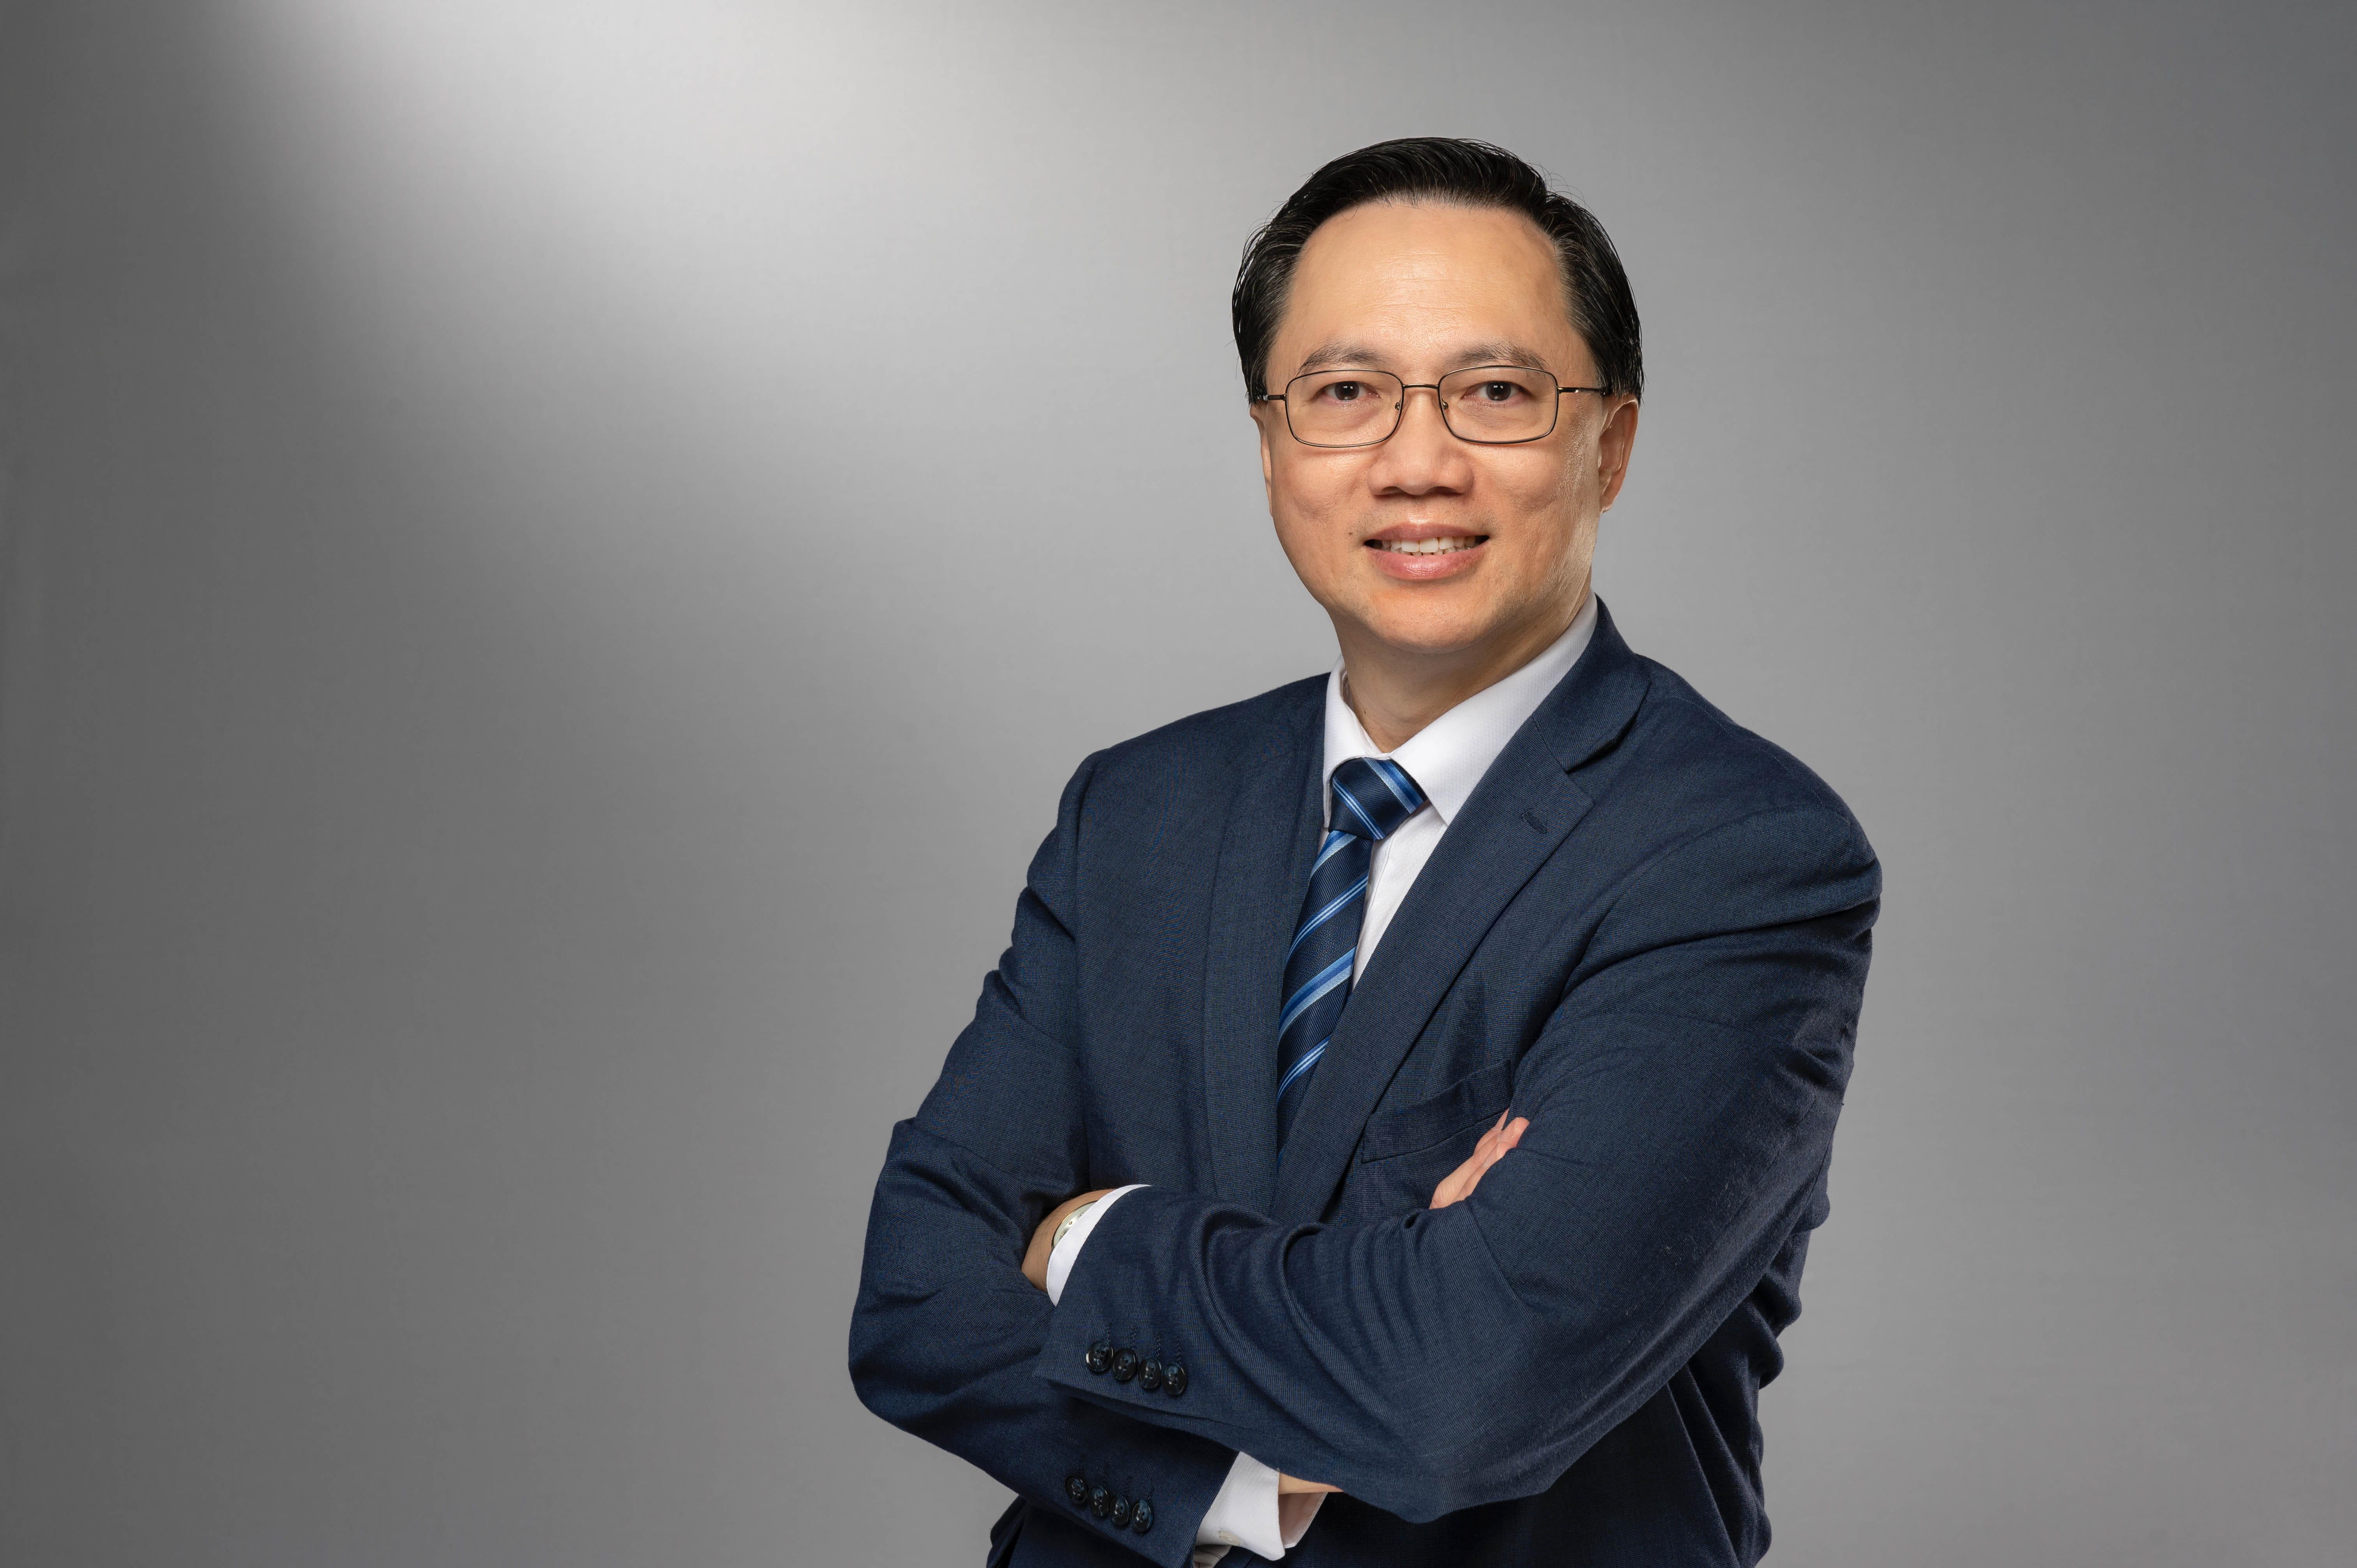 Teik C. Lim